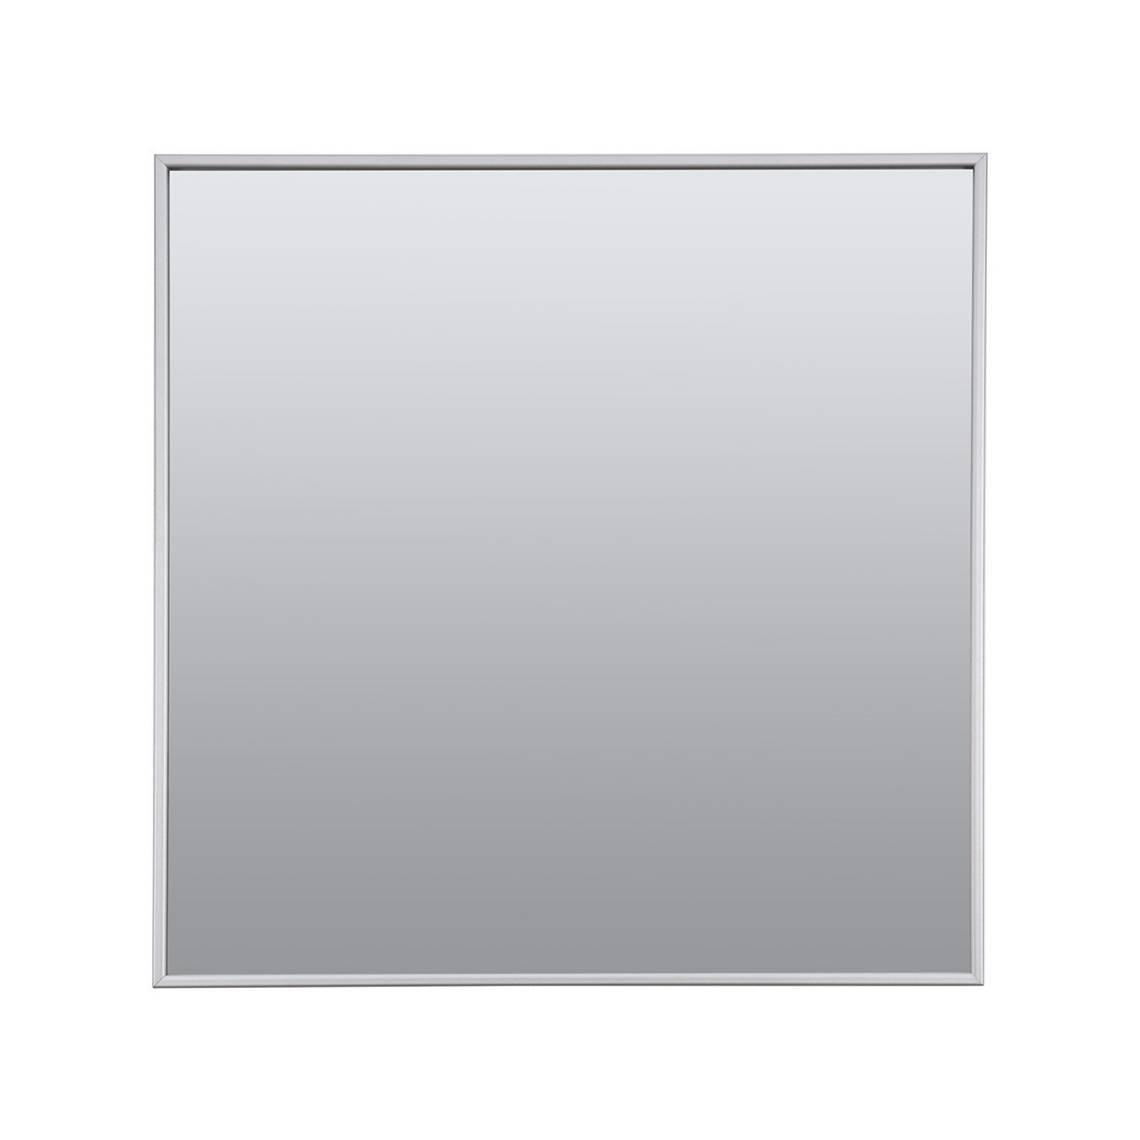 Horm Ute Minimal Designer Spiegel Design Möbel